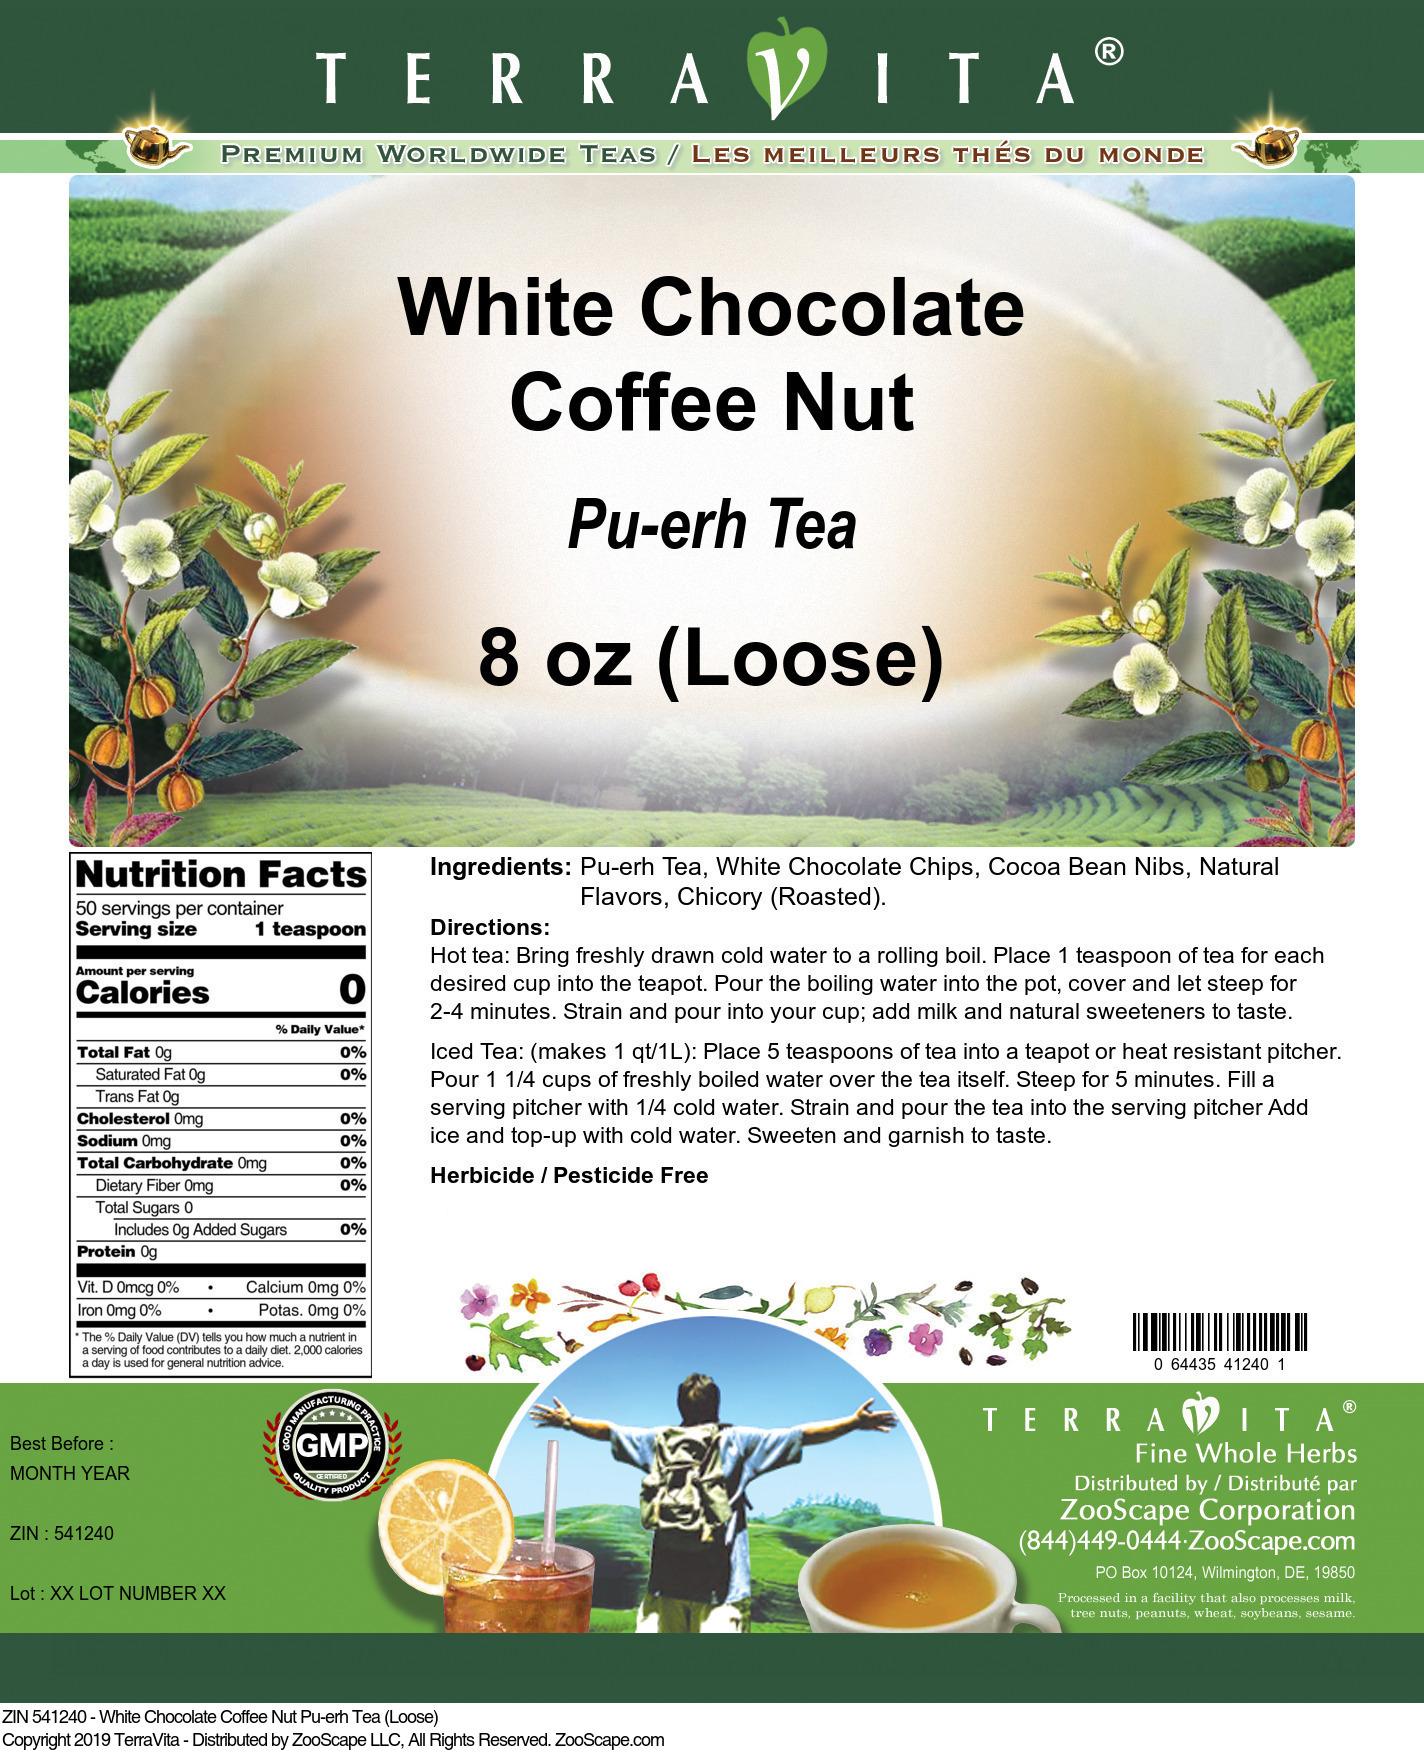 White Chocolate Coffee Nut Pu-erh Tea (Loose)